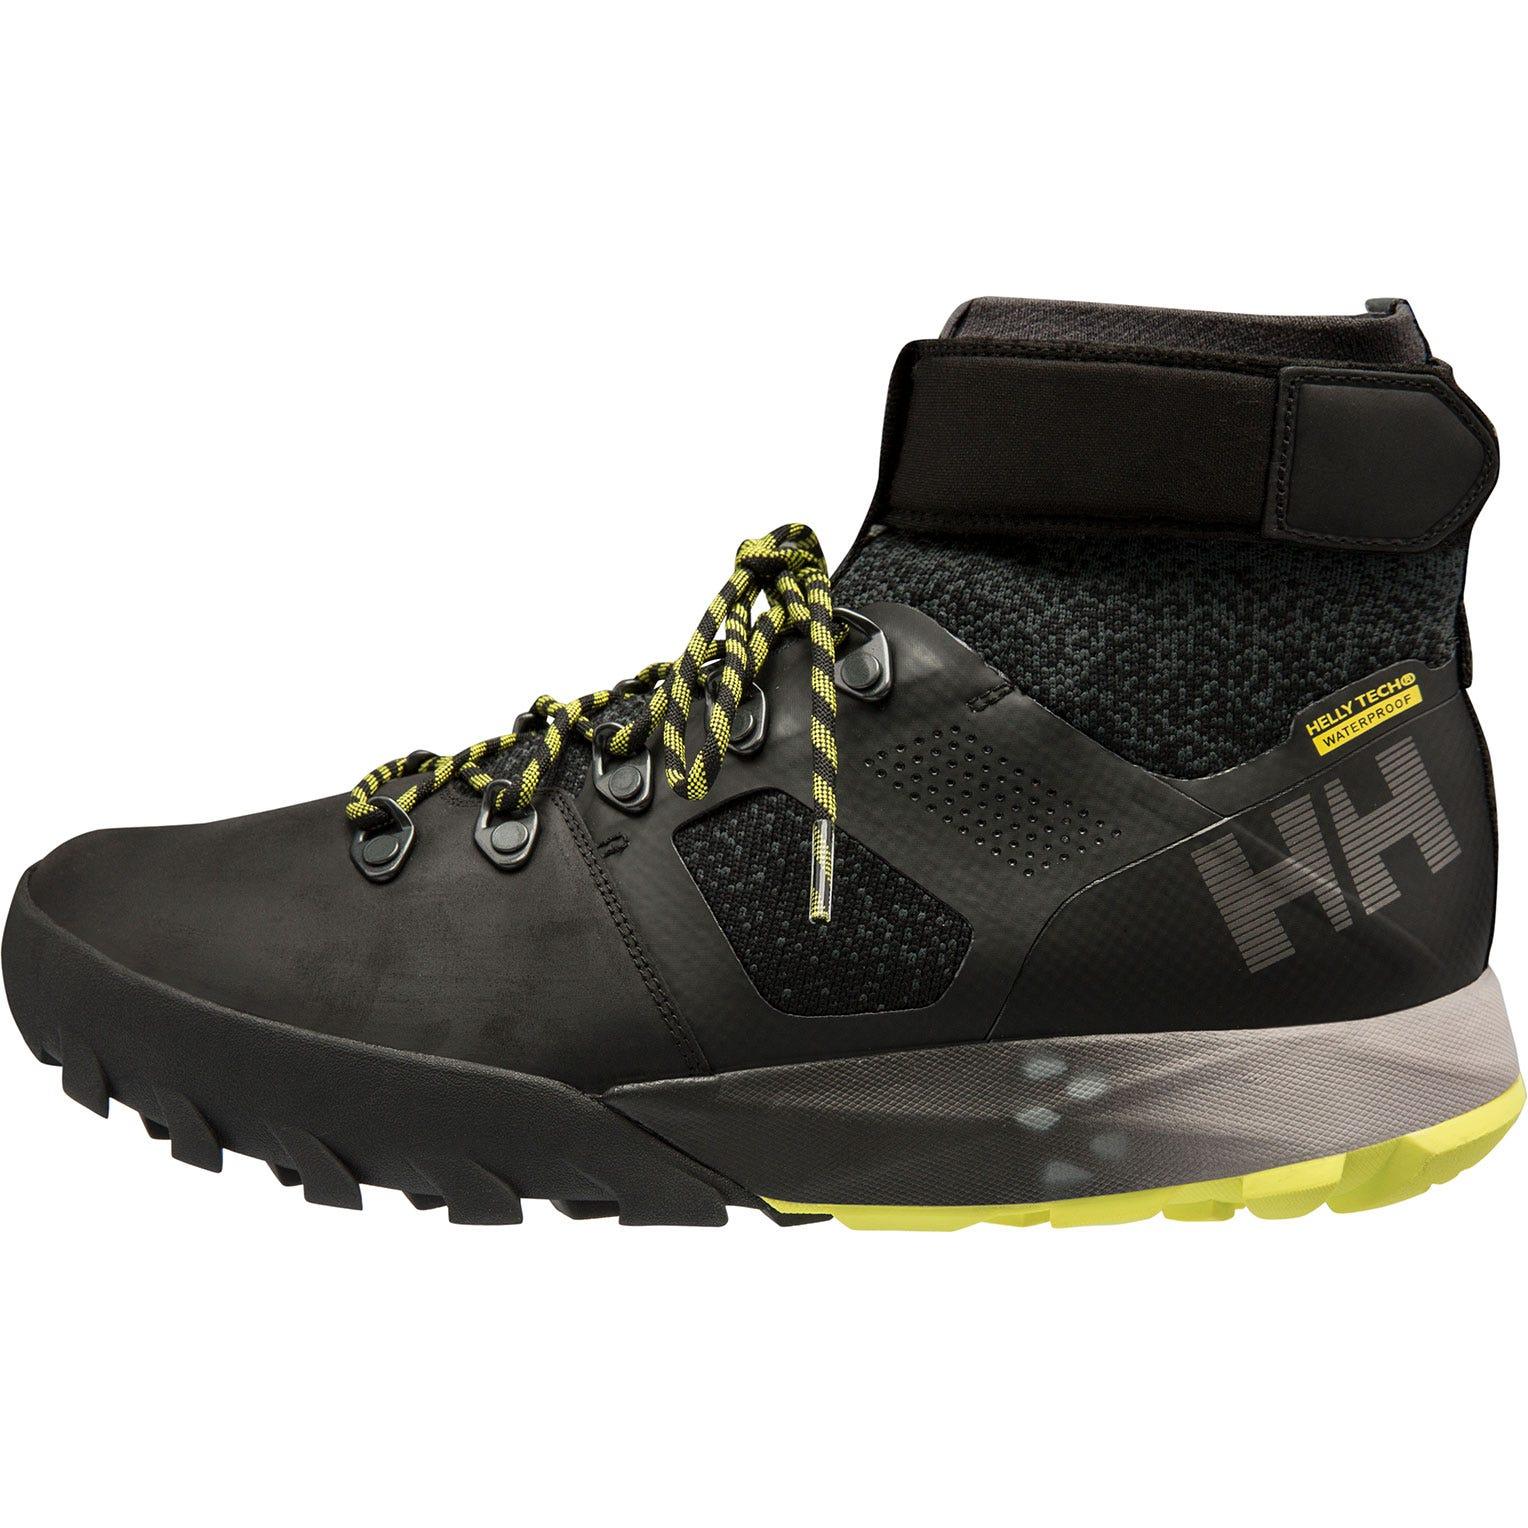 Helly Hansen Loke Vanquish Ht Mens Hiking Boot Black 45/11